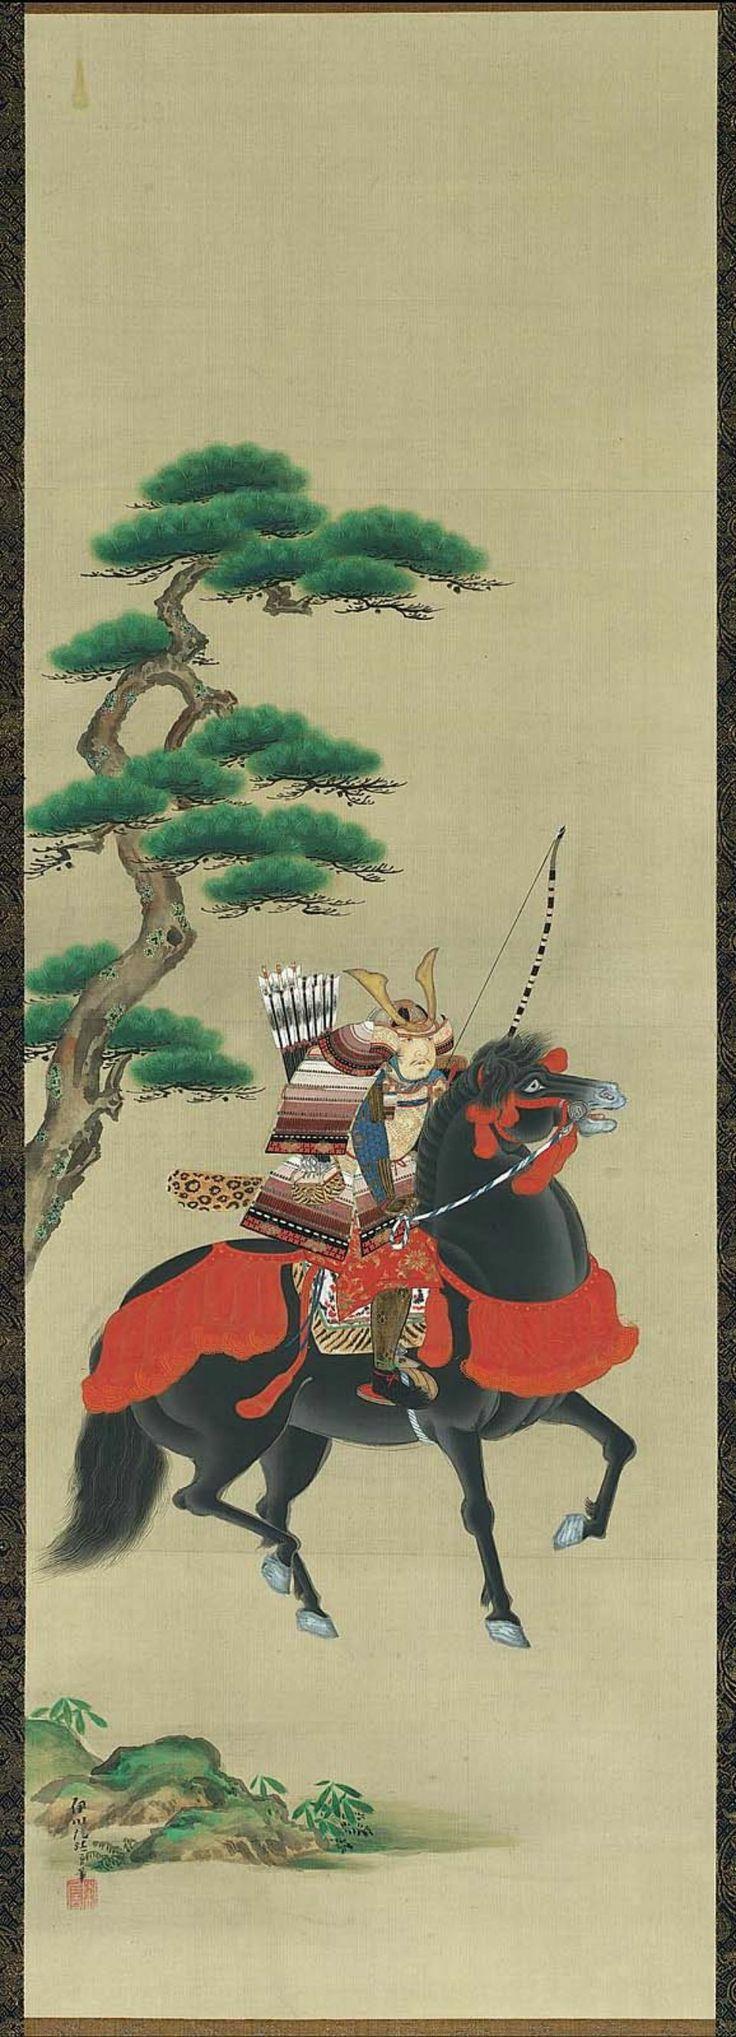 Minamoto no Yoshitsune on Horseback 源義経図 Japanese, Edo period, first half of the 19th century Kano Isen'in Naganobu, Japanese, 1775–1828